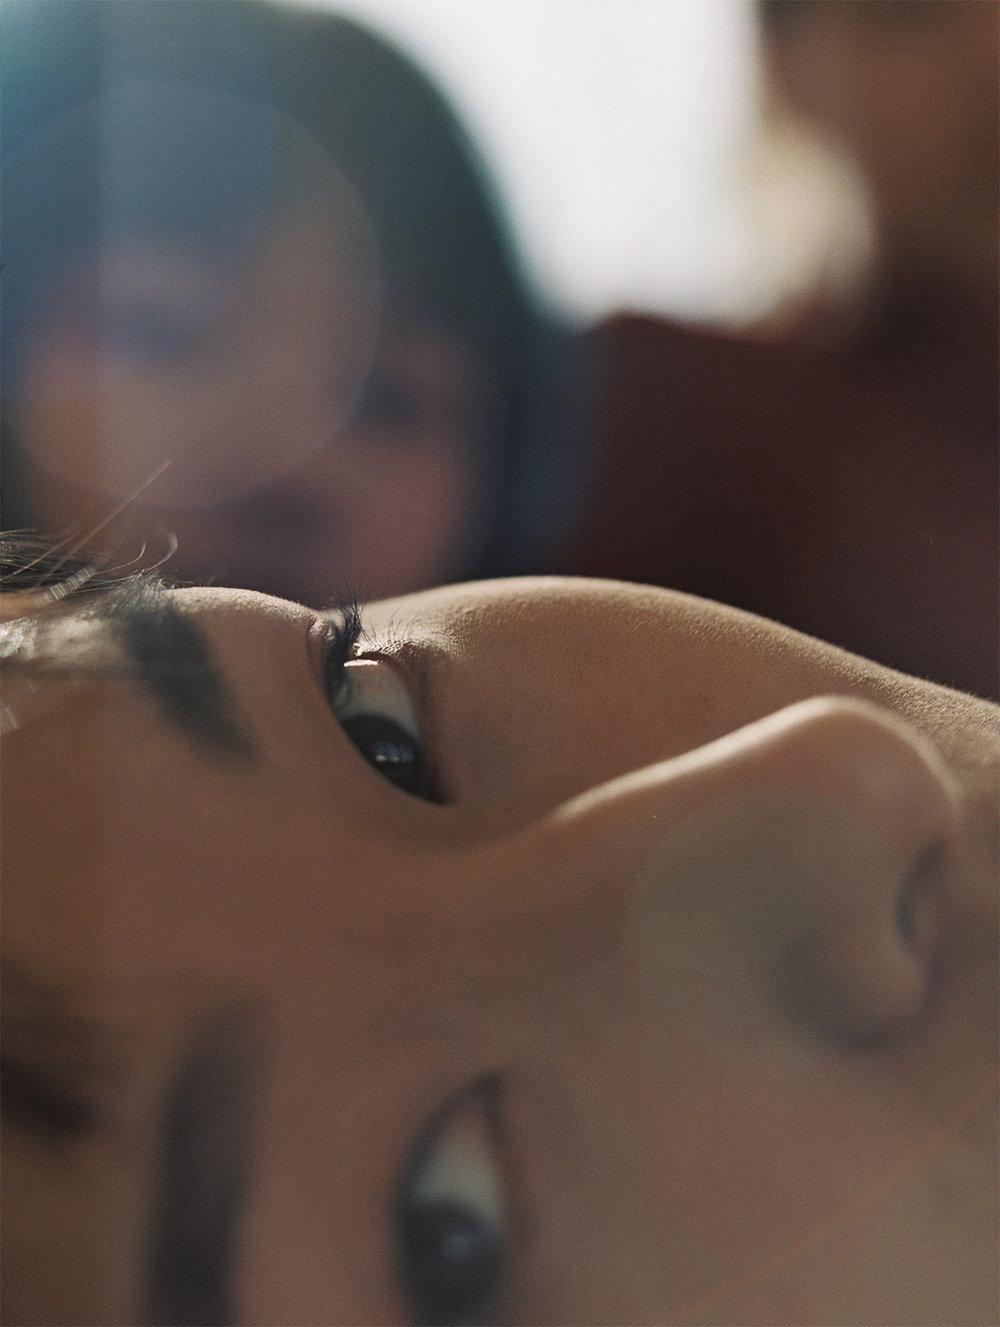 Ronan Mckenzie - XING - Elizabeth Gabrielle Lee - Photobook Challenges Sexualization on Asian Women.jpg